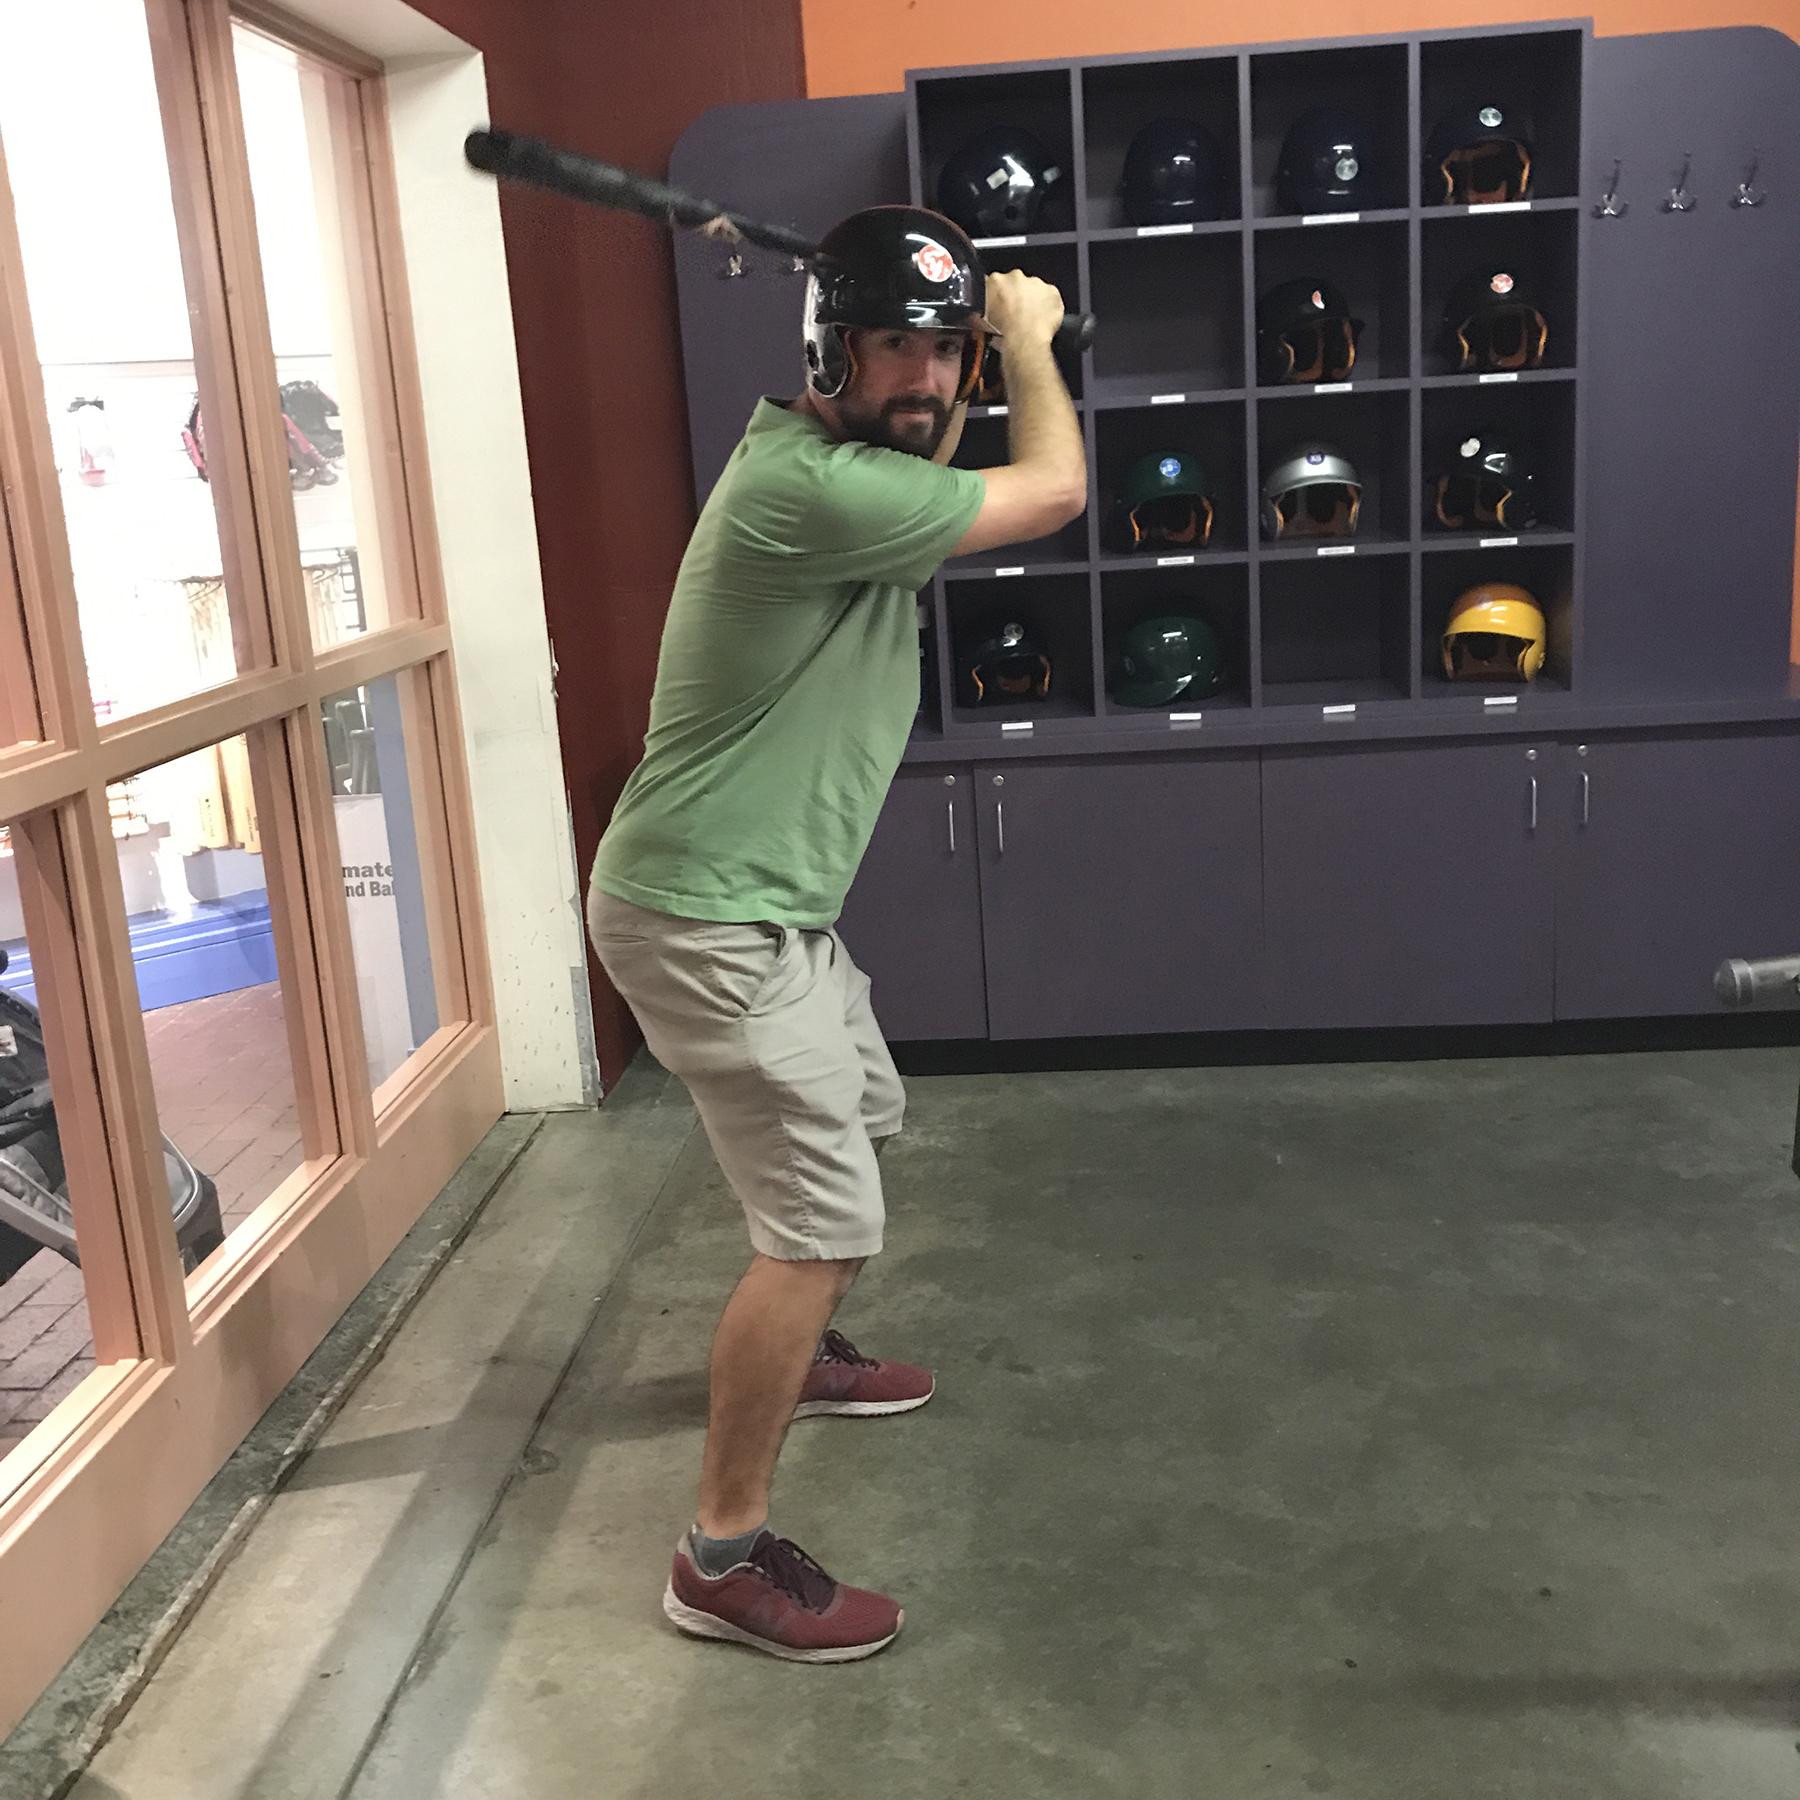 She had a better batting average | October | Louisville Slugger Museum, Louisville, KY